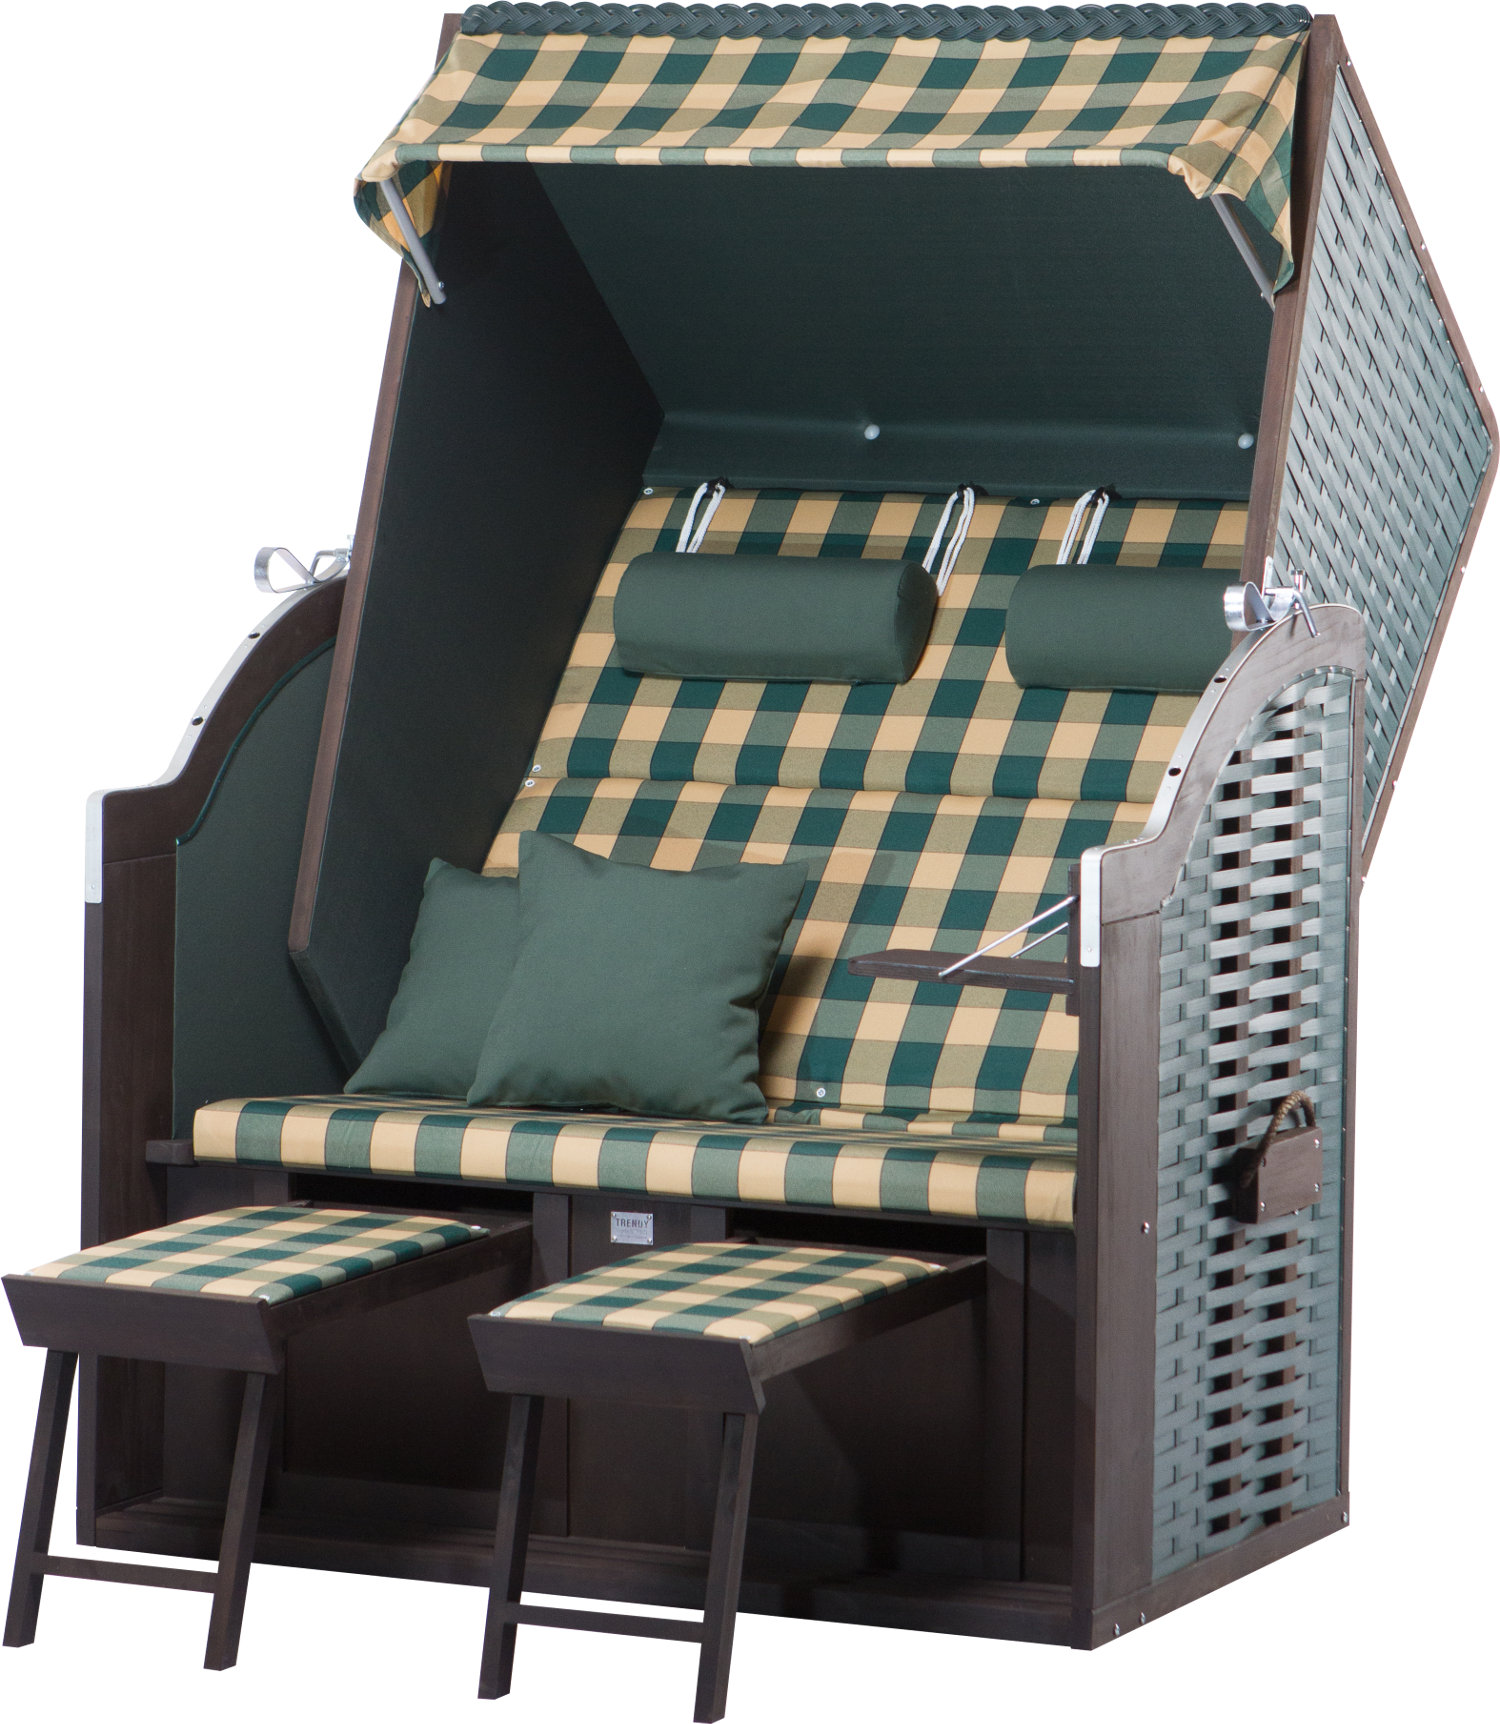 strandkorb twin compact pe green dessin 353. Black Bedroom Furniture Sets. Home Design Ideas